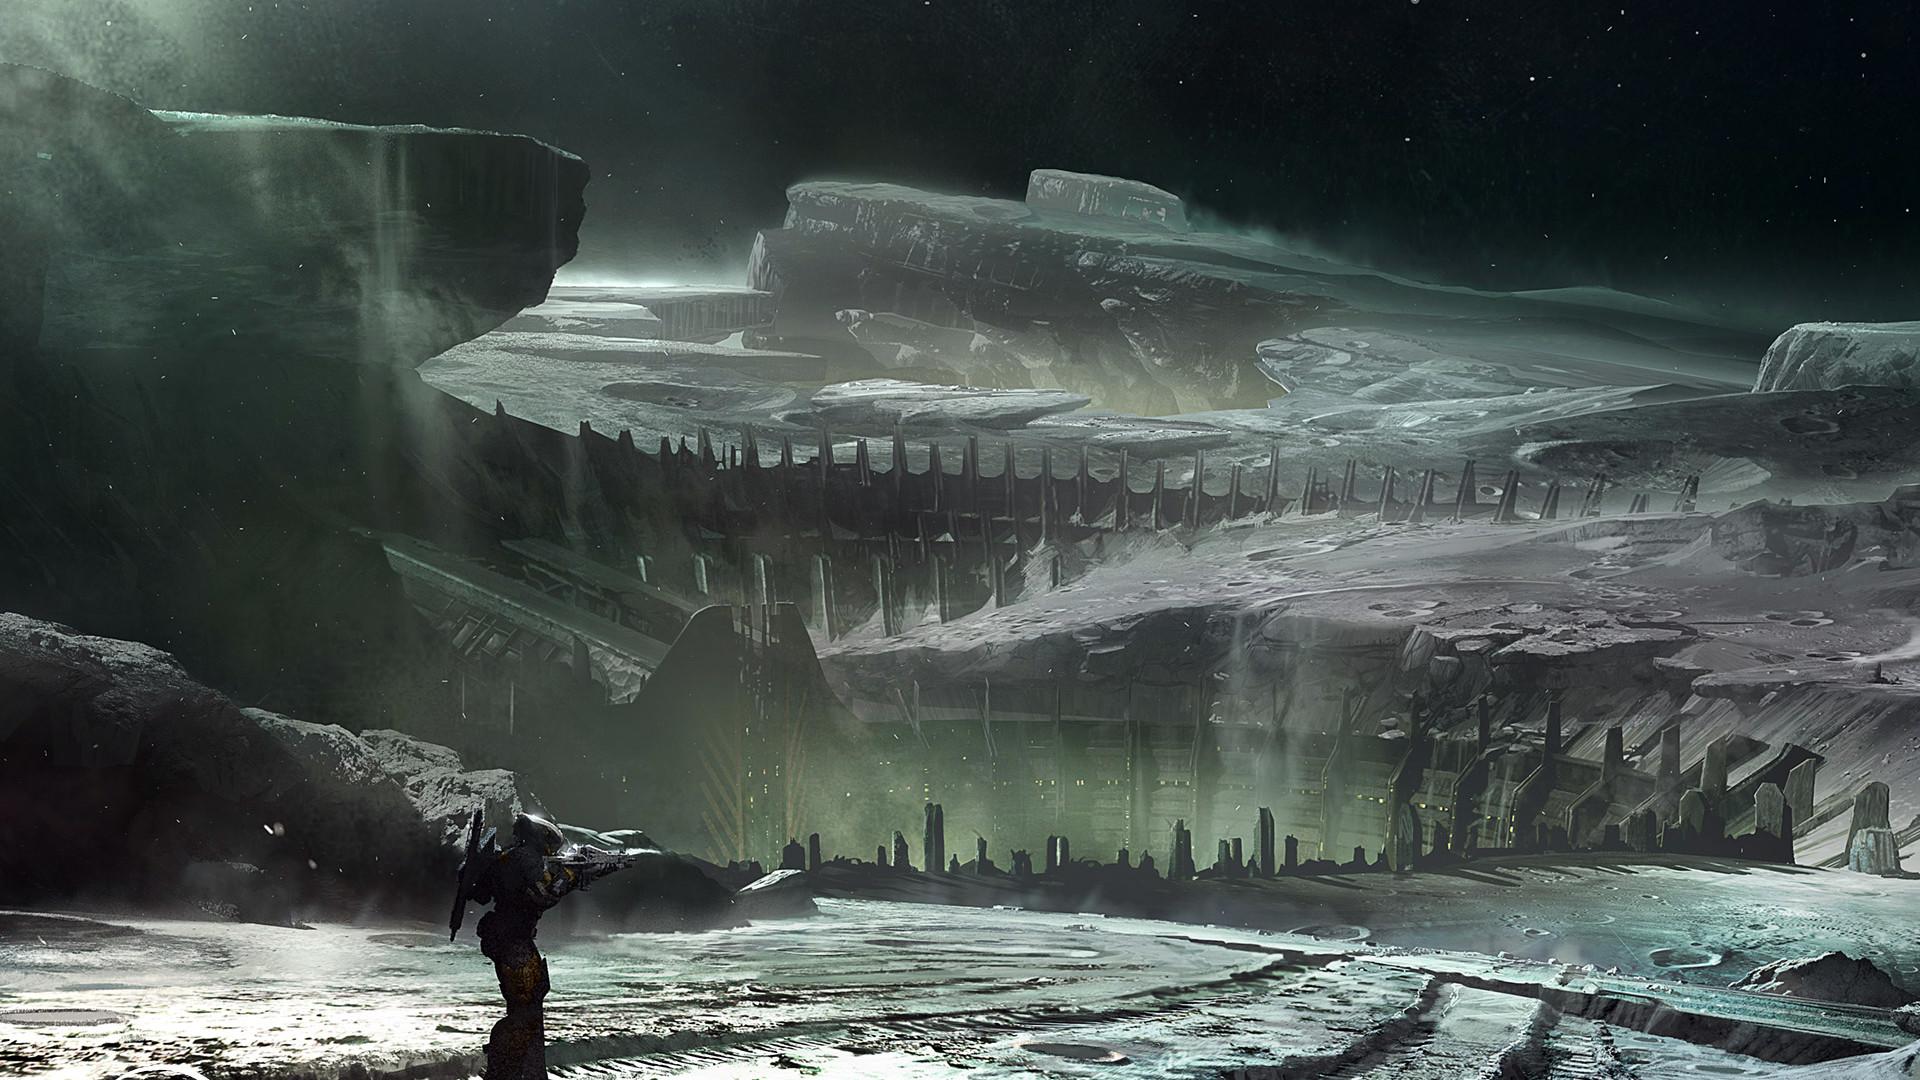 Moon Surface Destiny Wallpaper HD